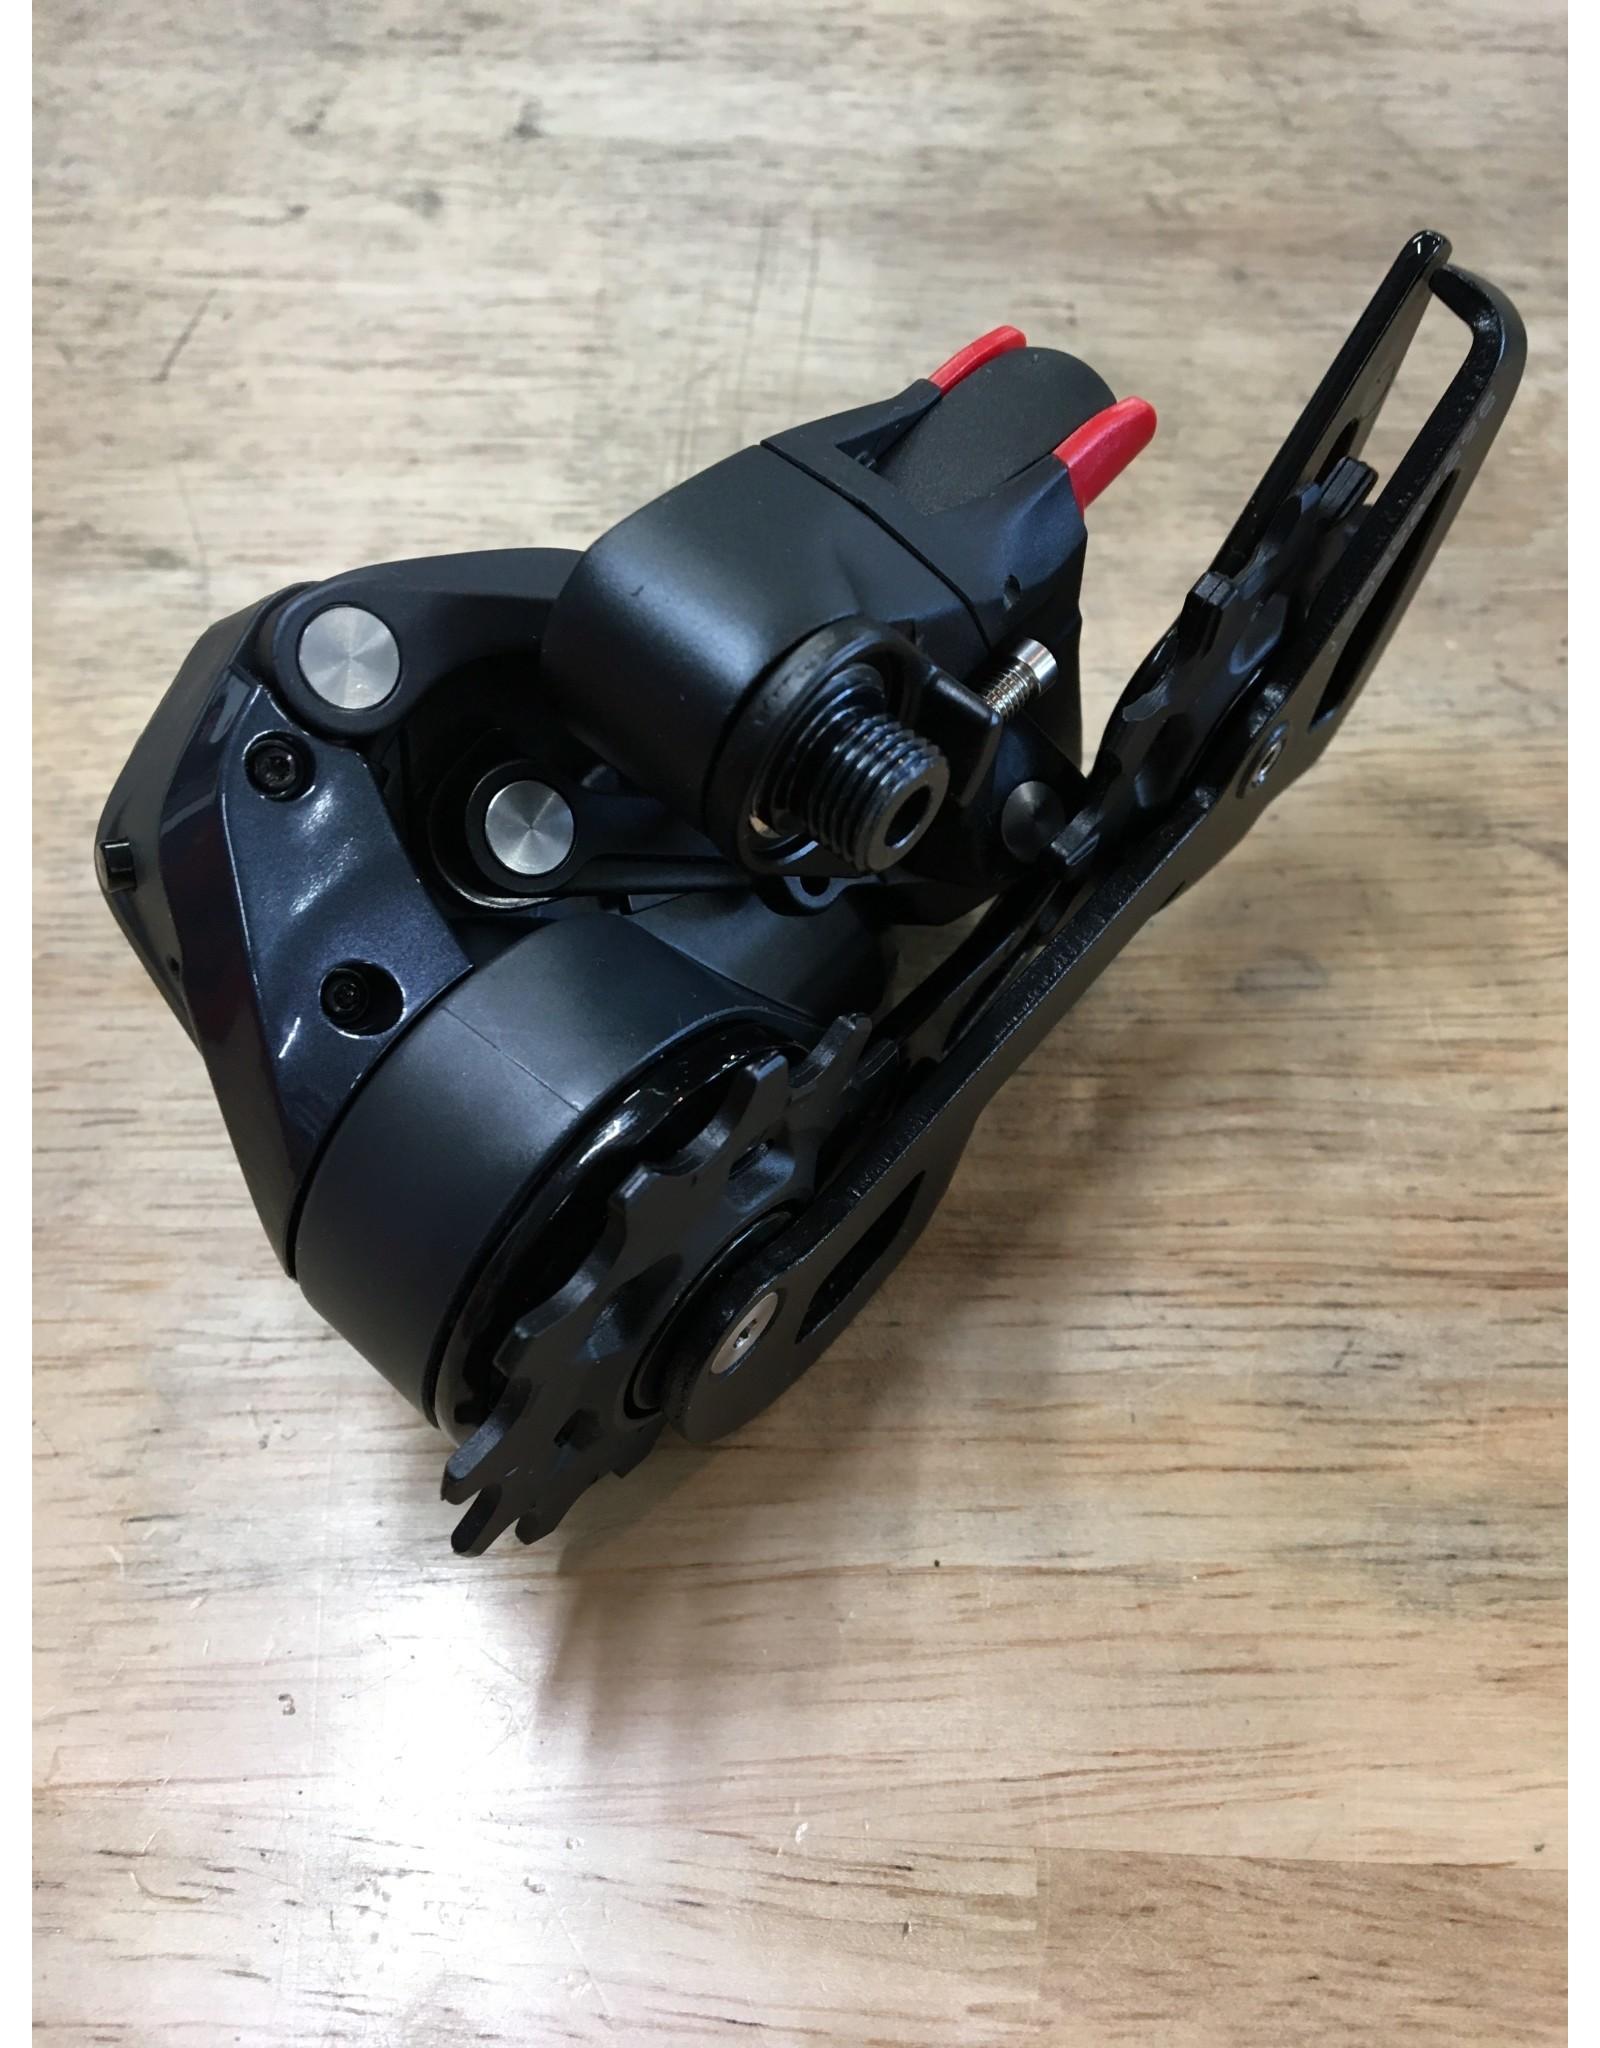 SRAM No Retail Packaging: SRAM Force eTap AXS Derailleur Electronic Road - 1x, 12-Speed, eTap AXS Rear Derailleur, Short Cage D1